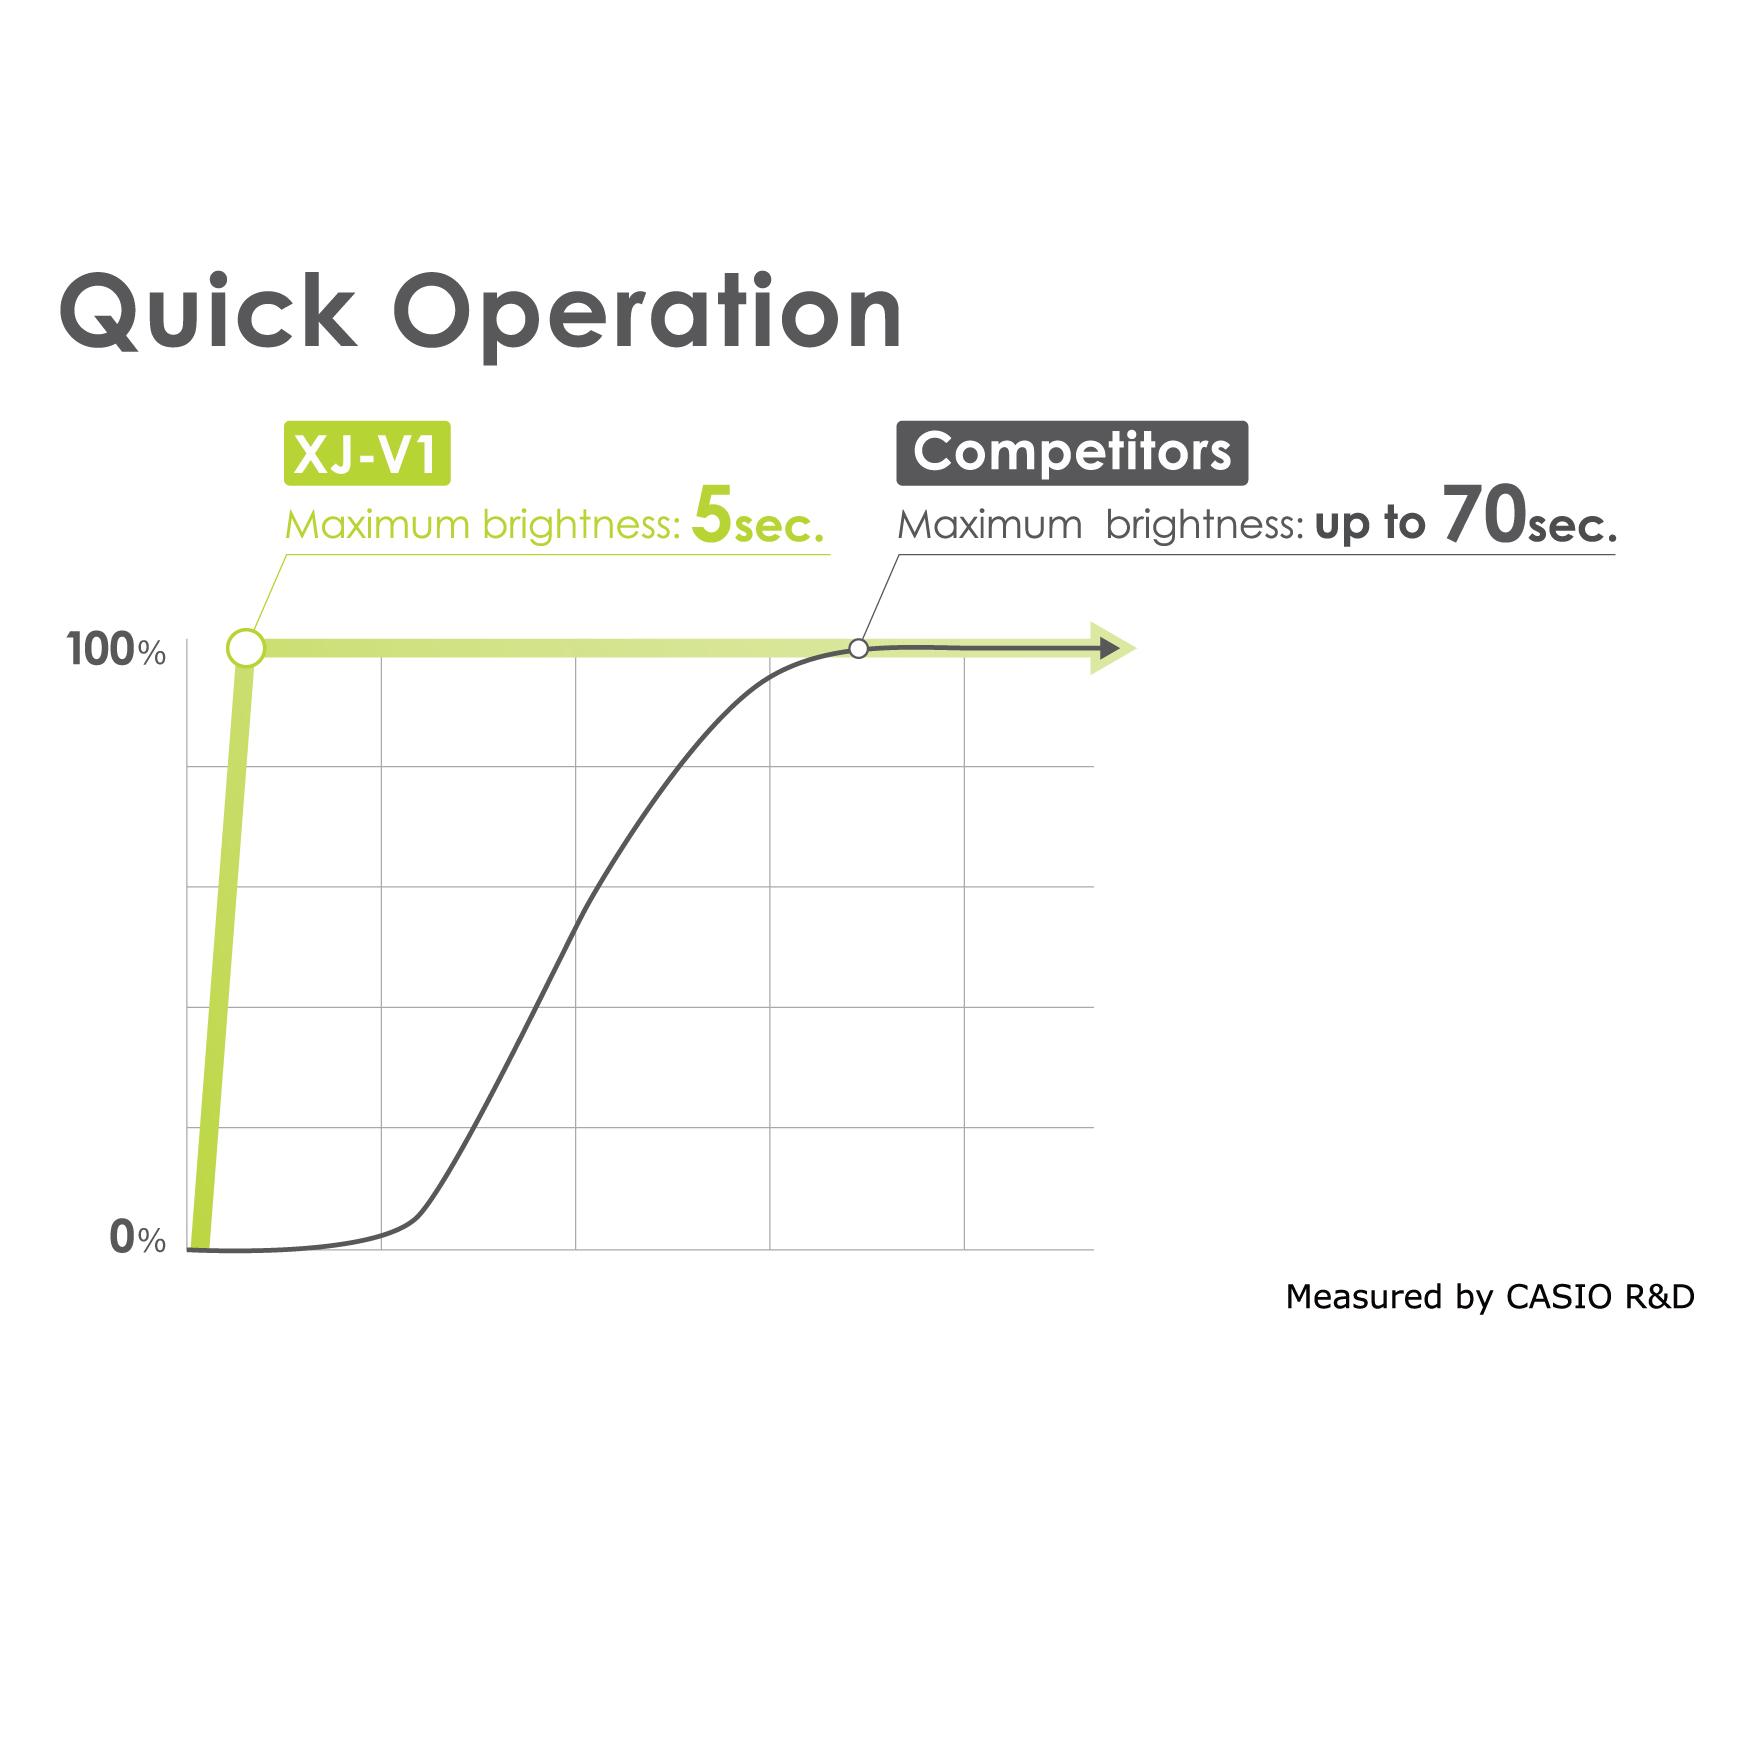 Quick Operation